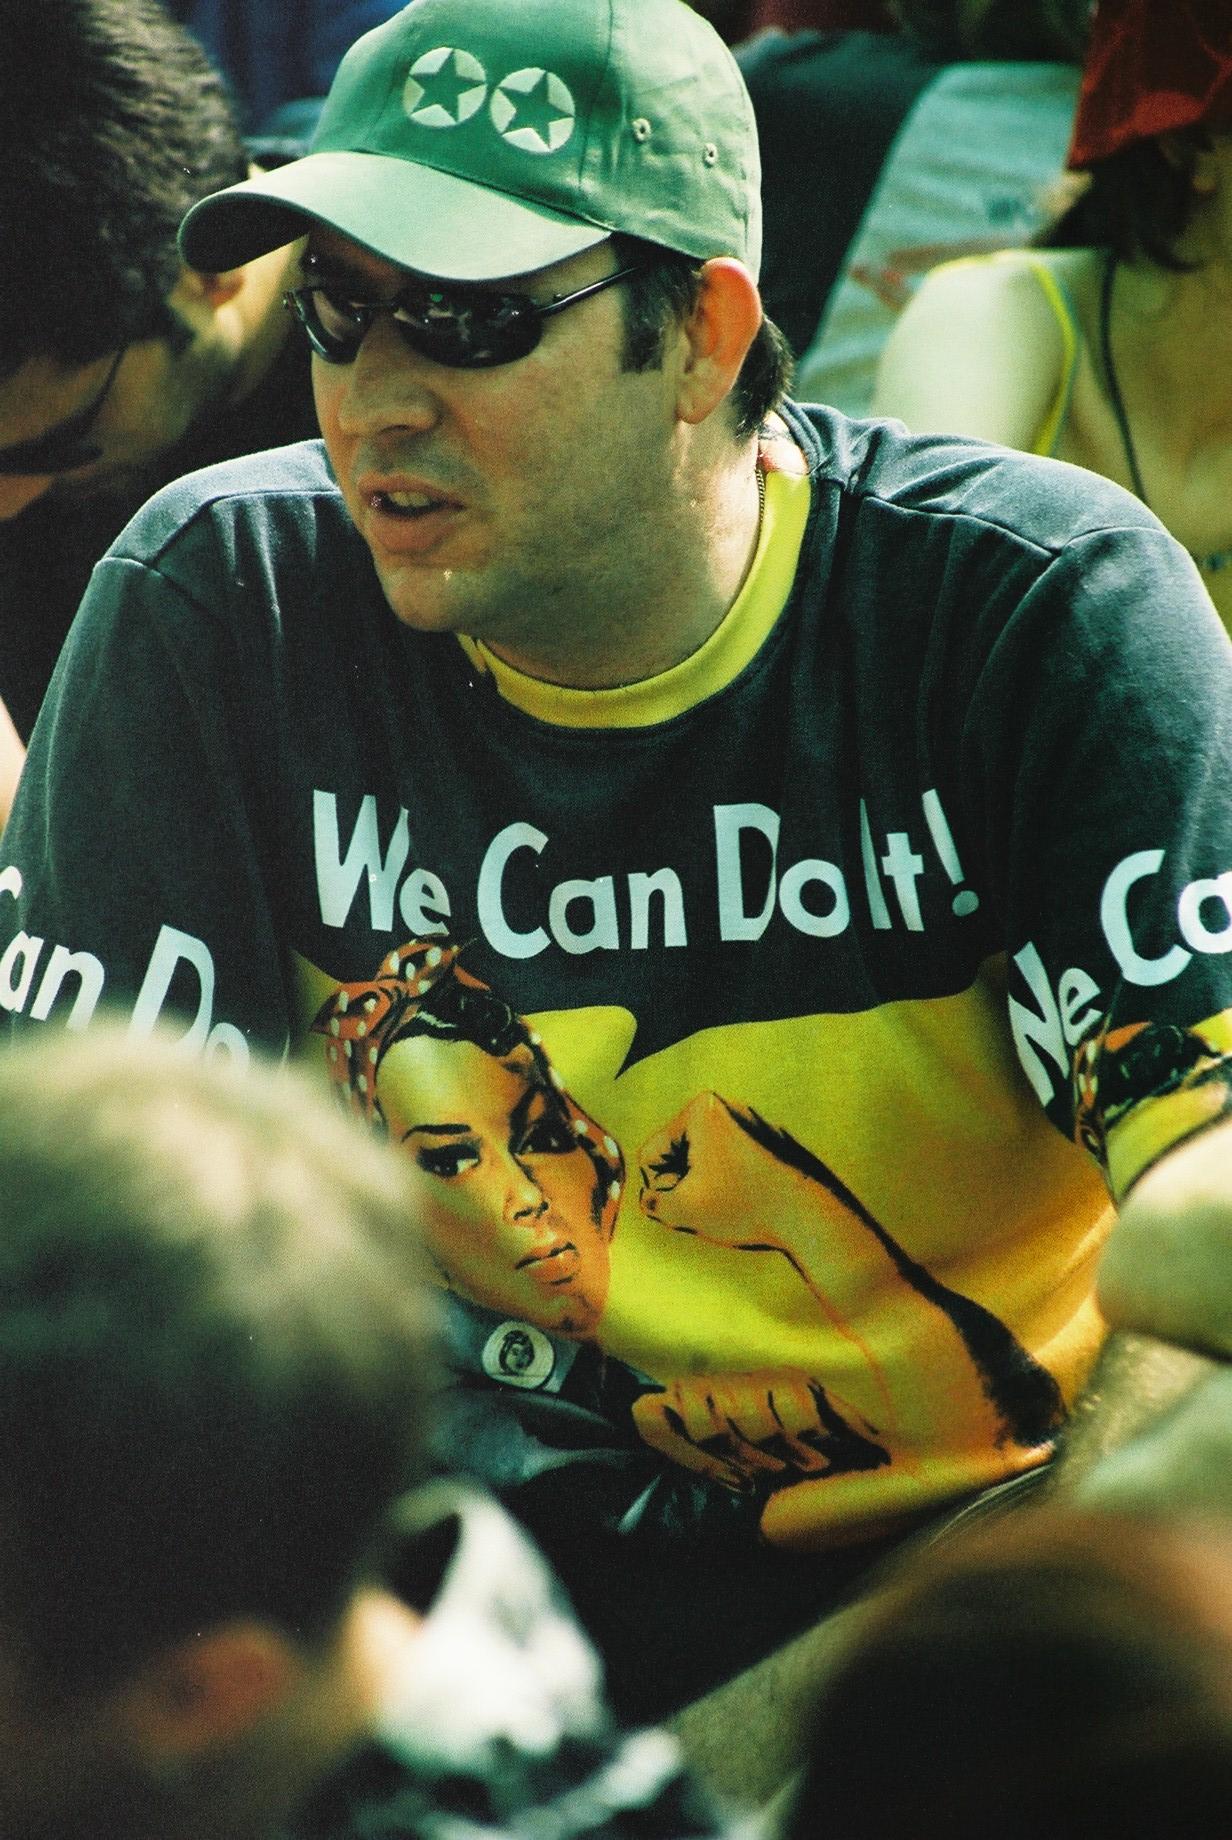 We Can Do It, Barcelona.JPG